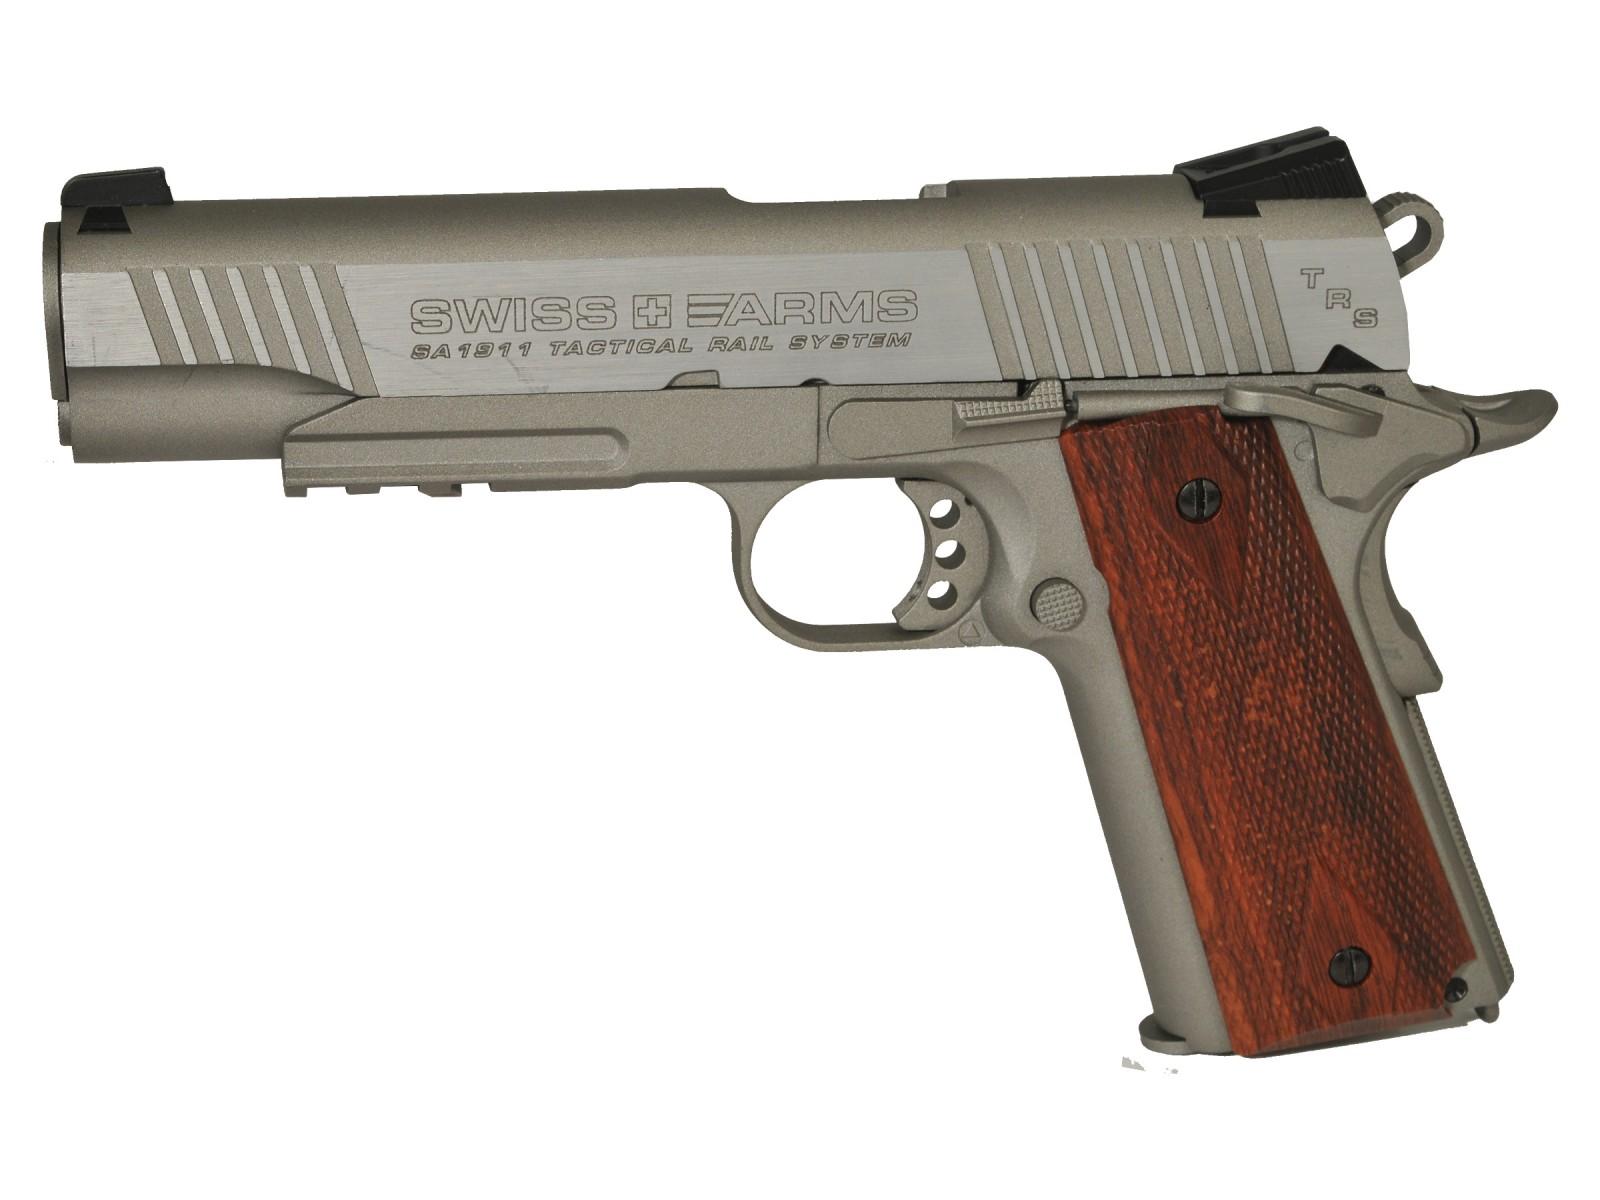 Cheap Swiss Arms SA 1911 TRS CO2 BB Pistol, Brown Grips 0.177